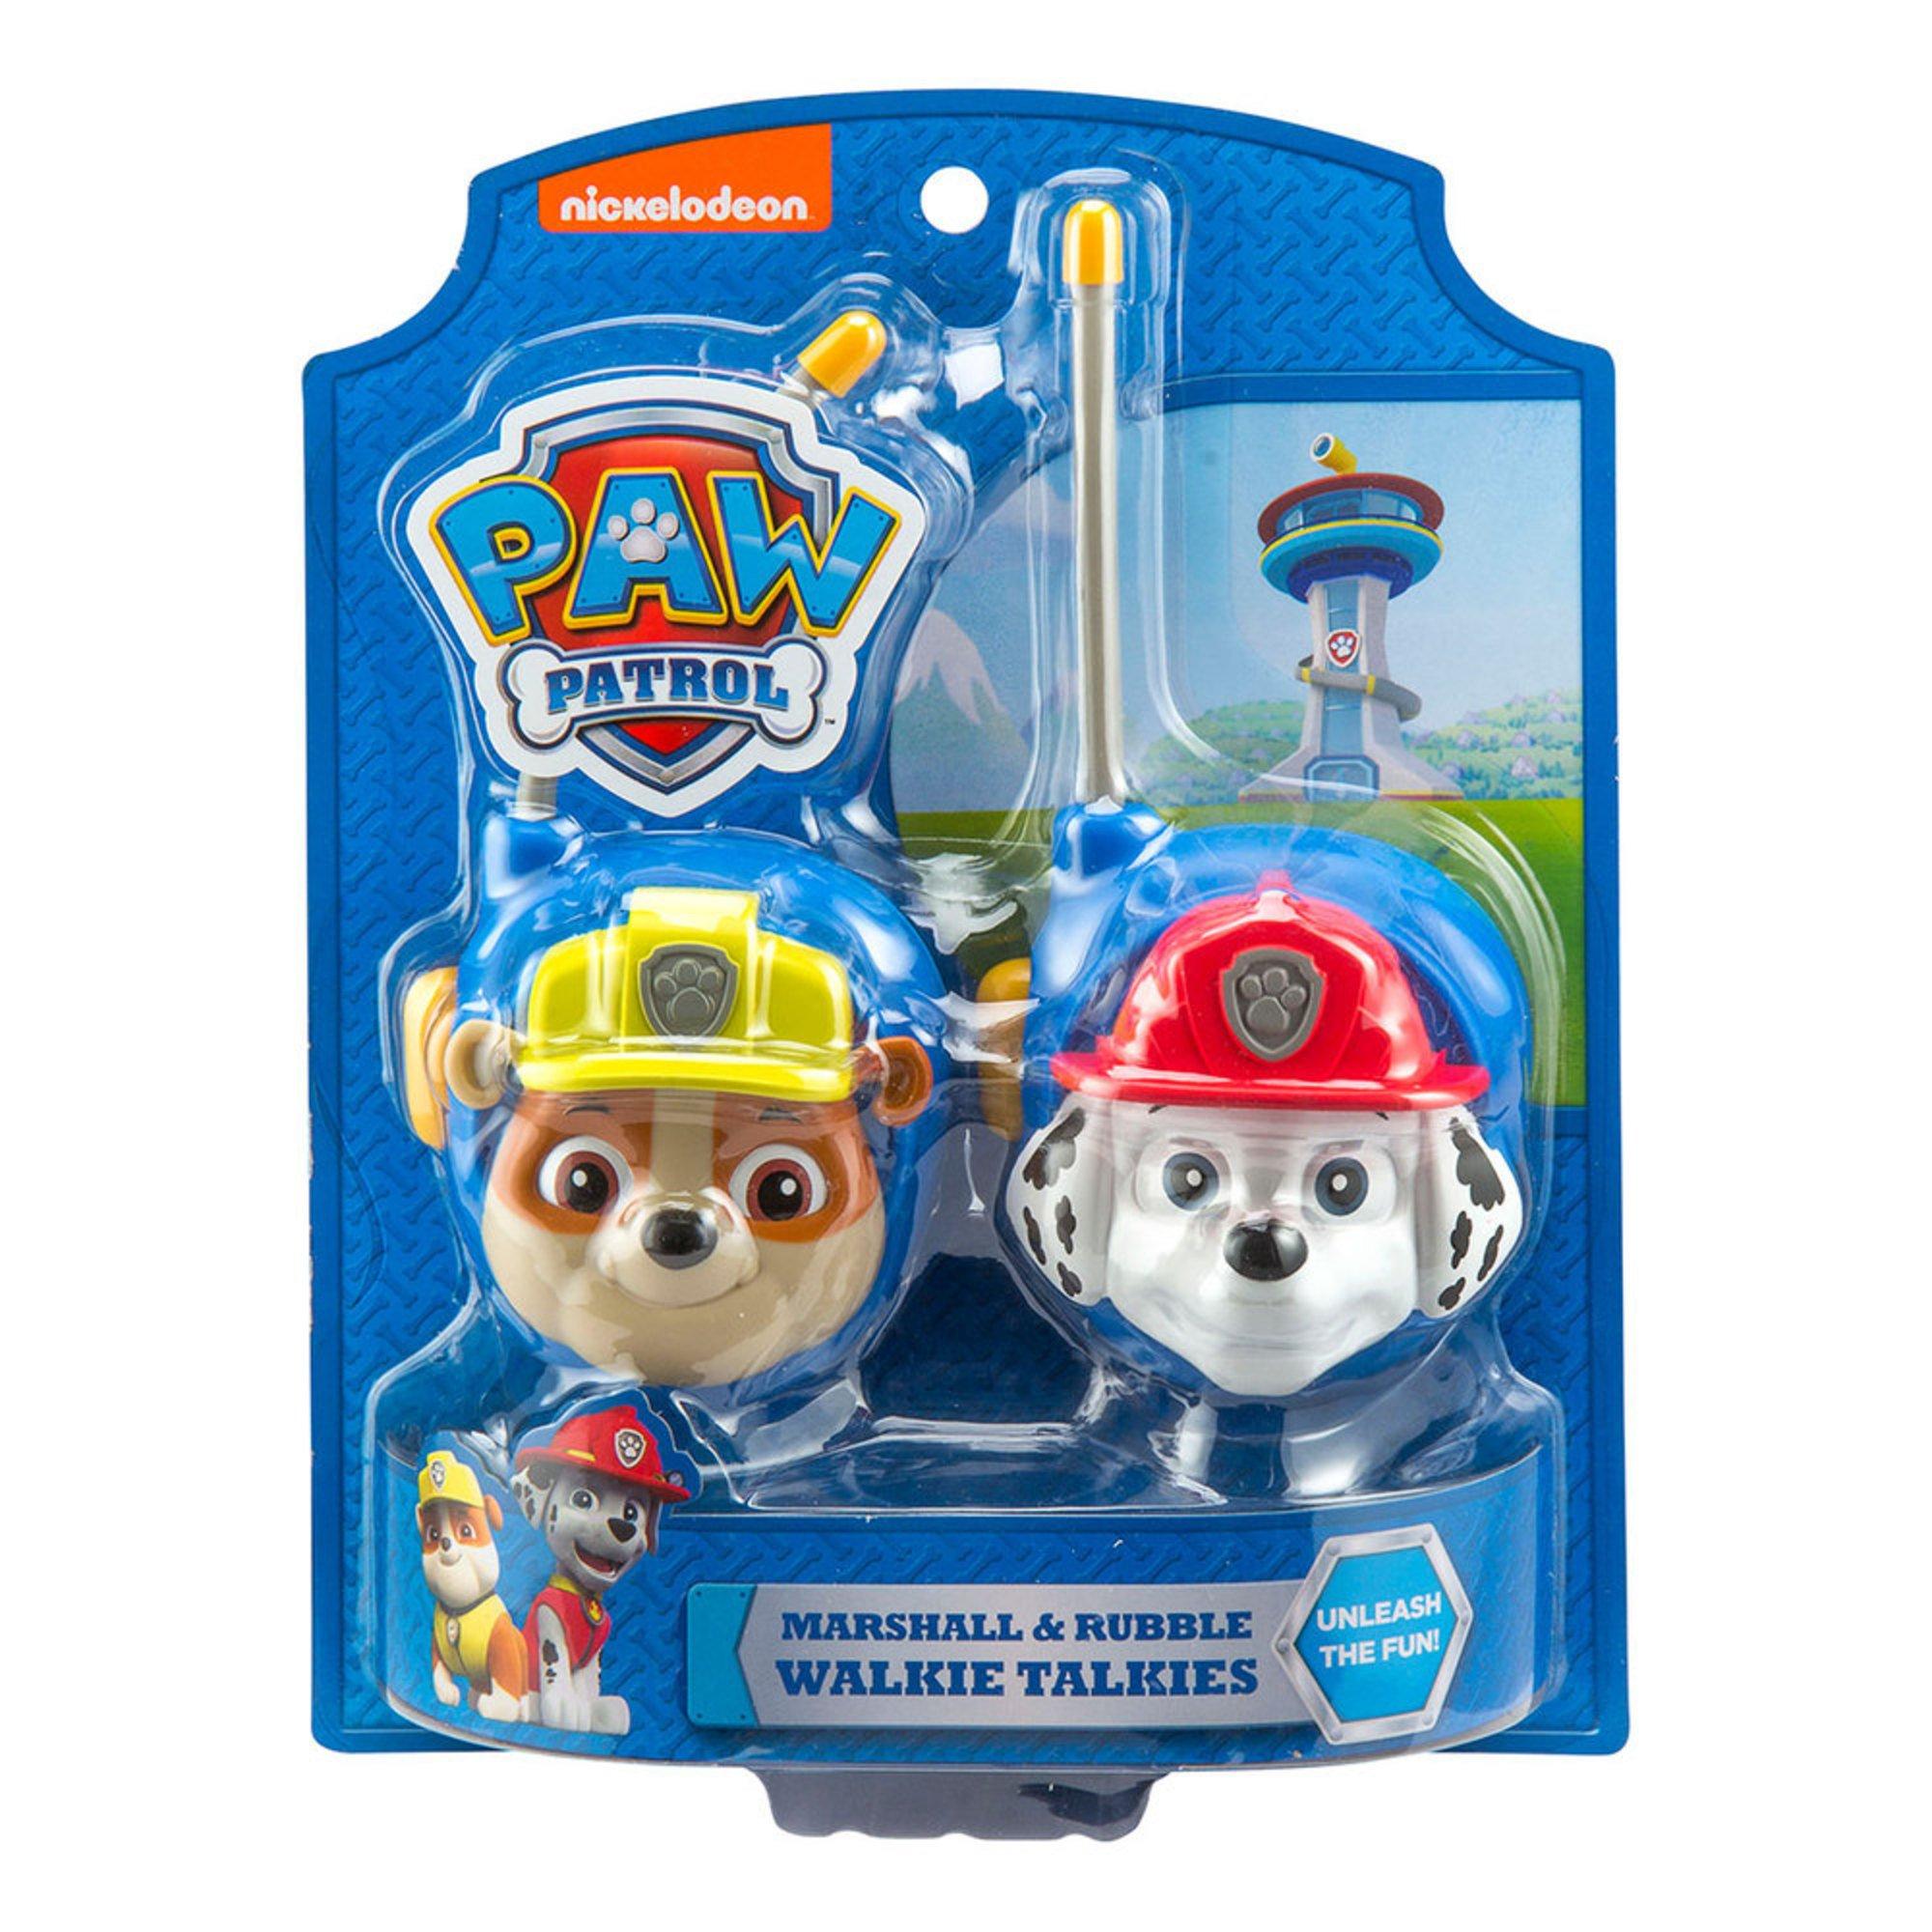 Paw Patrol Walkie Talkies | Early Learning Toys